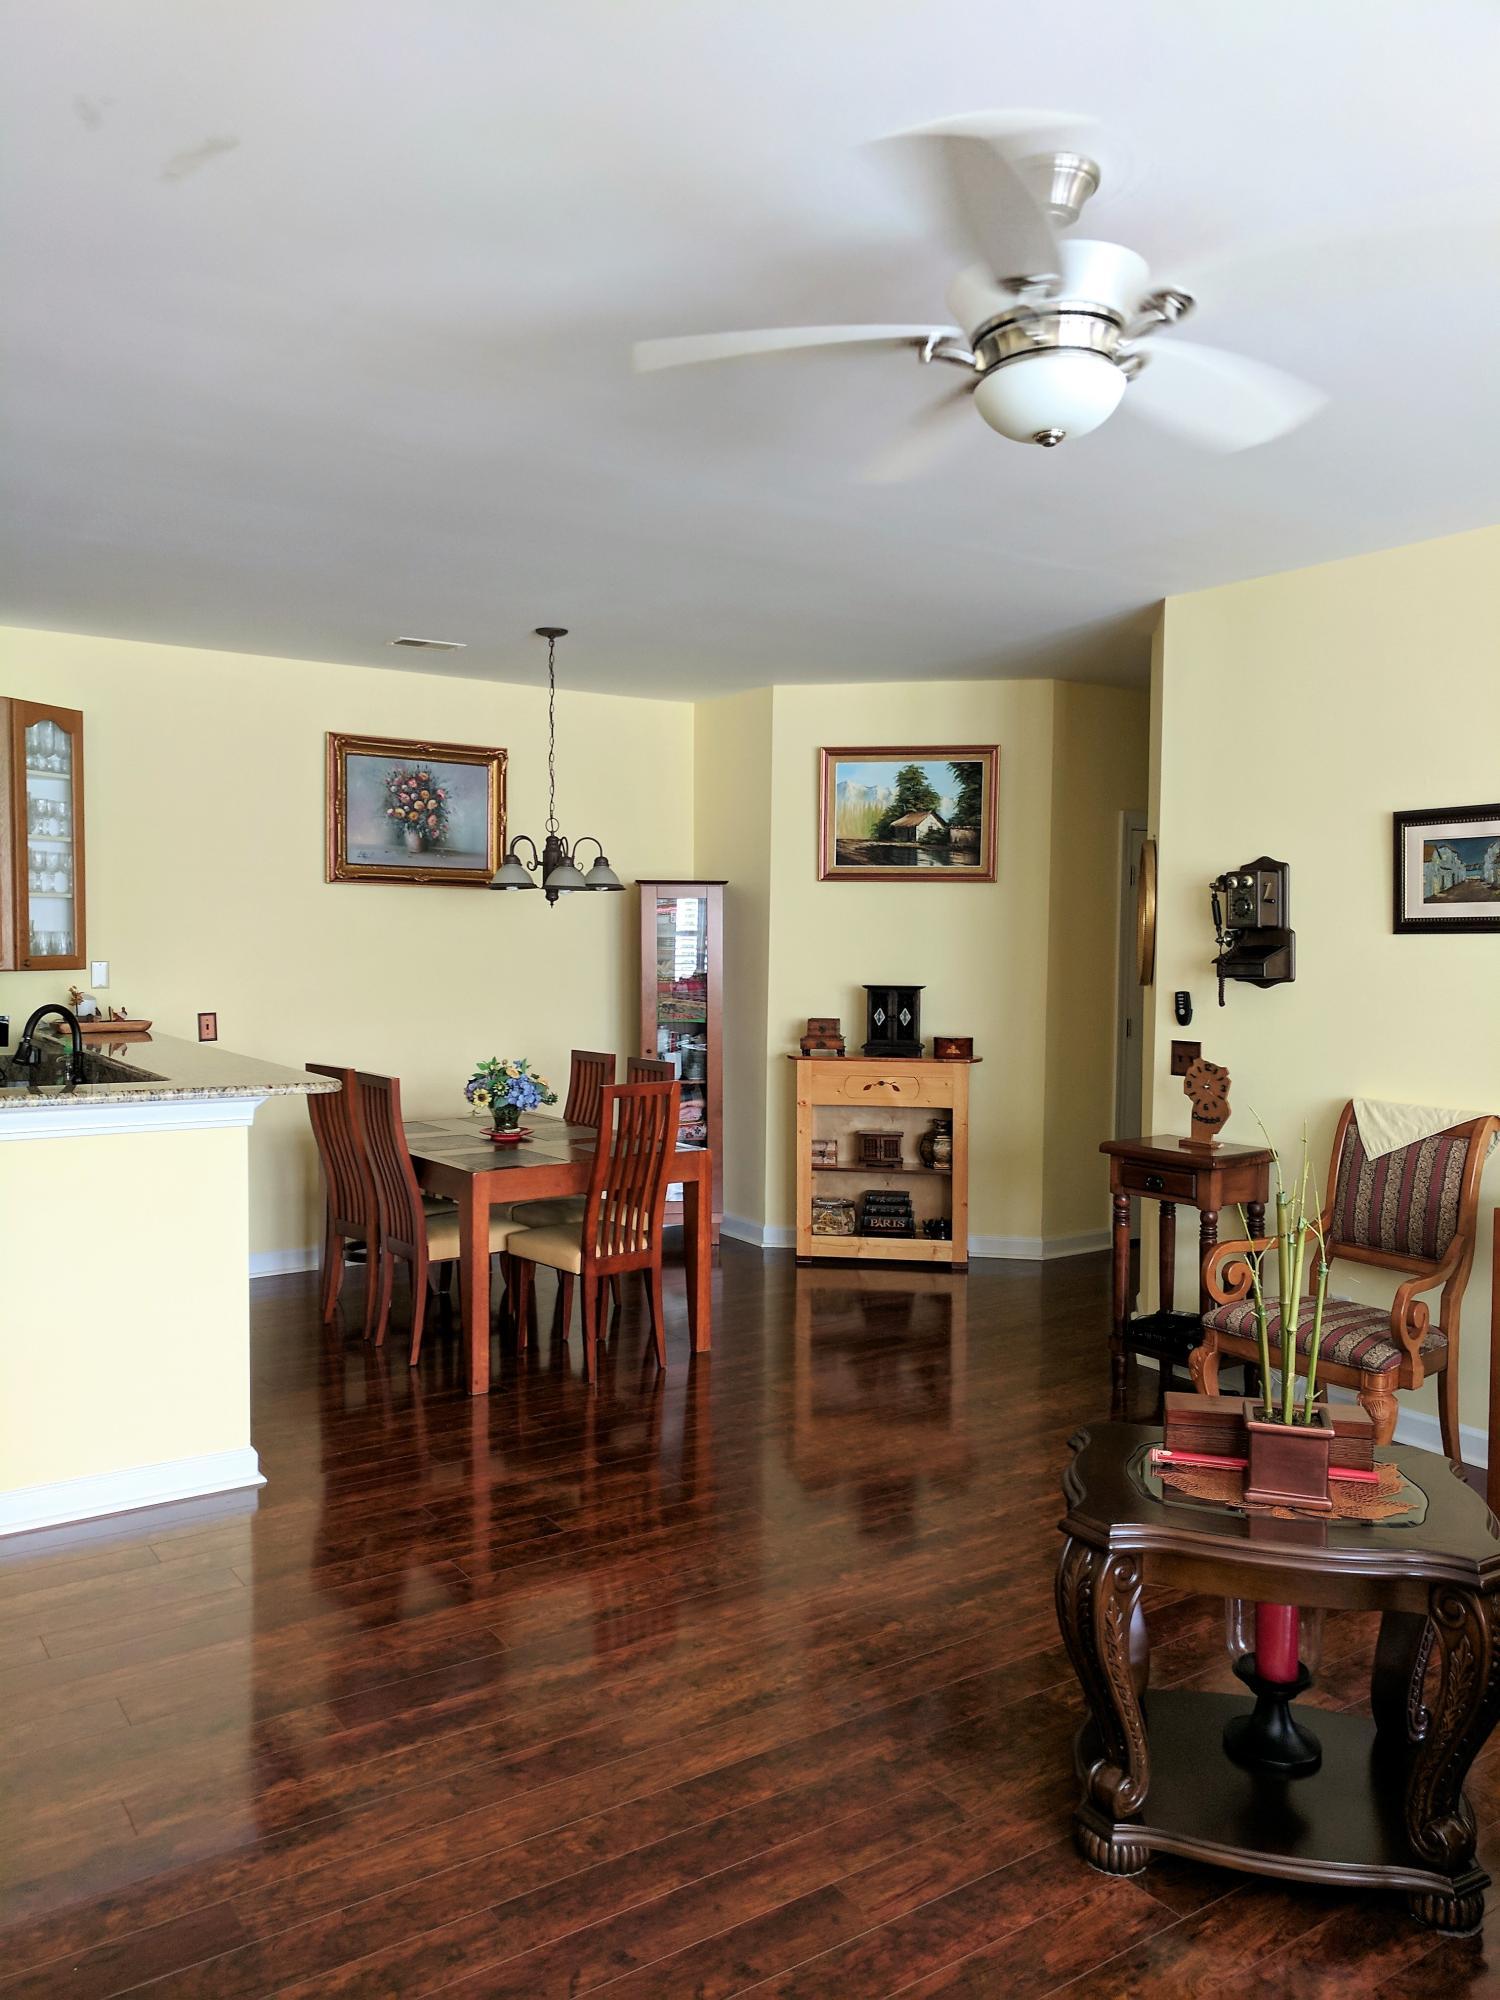 Dunes West Homes For Sale - 1362 Kingsford, Mount Pleasant, SC - 10